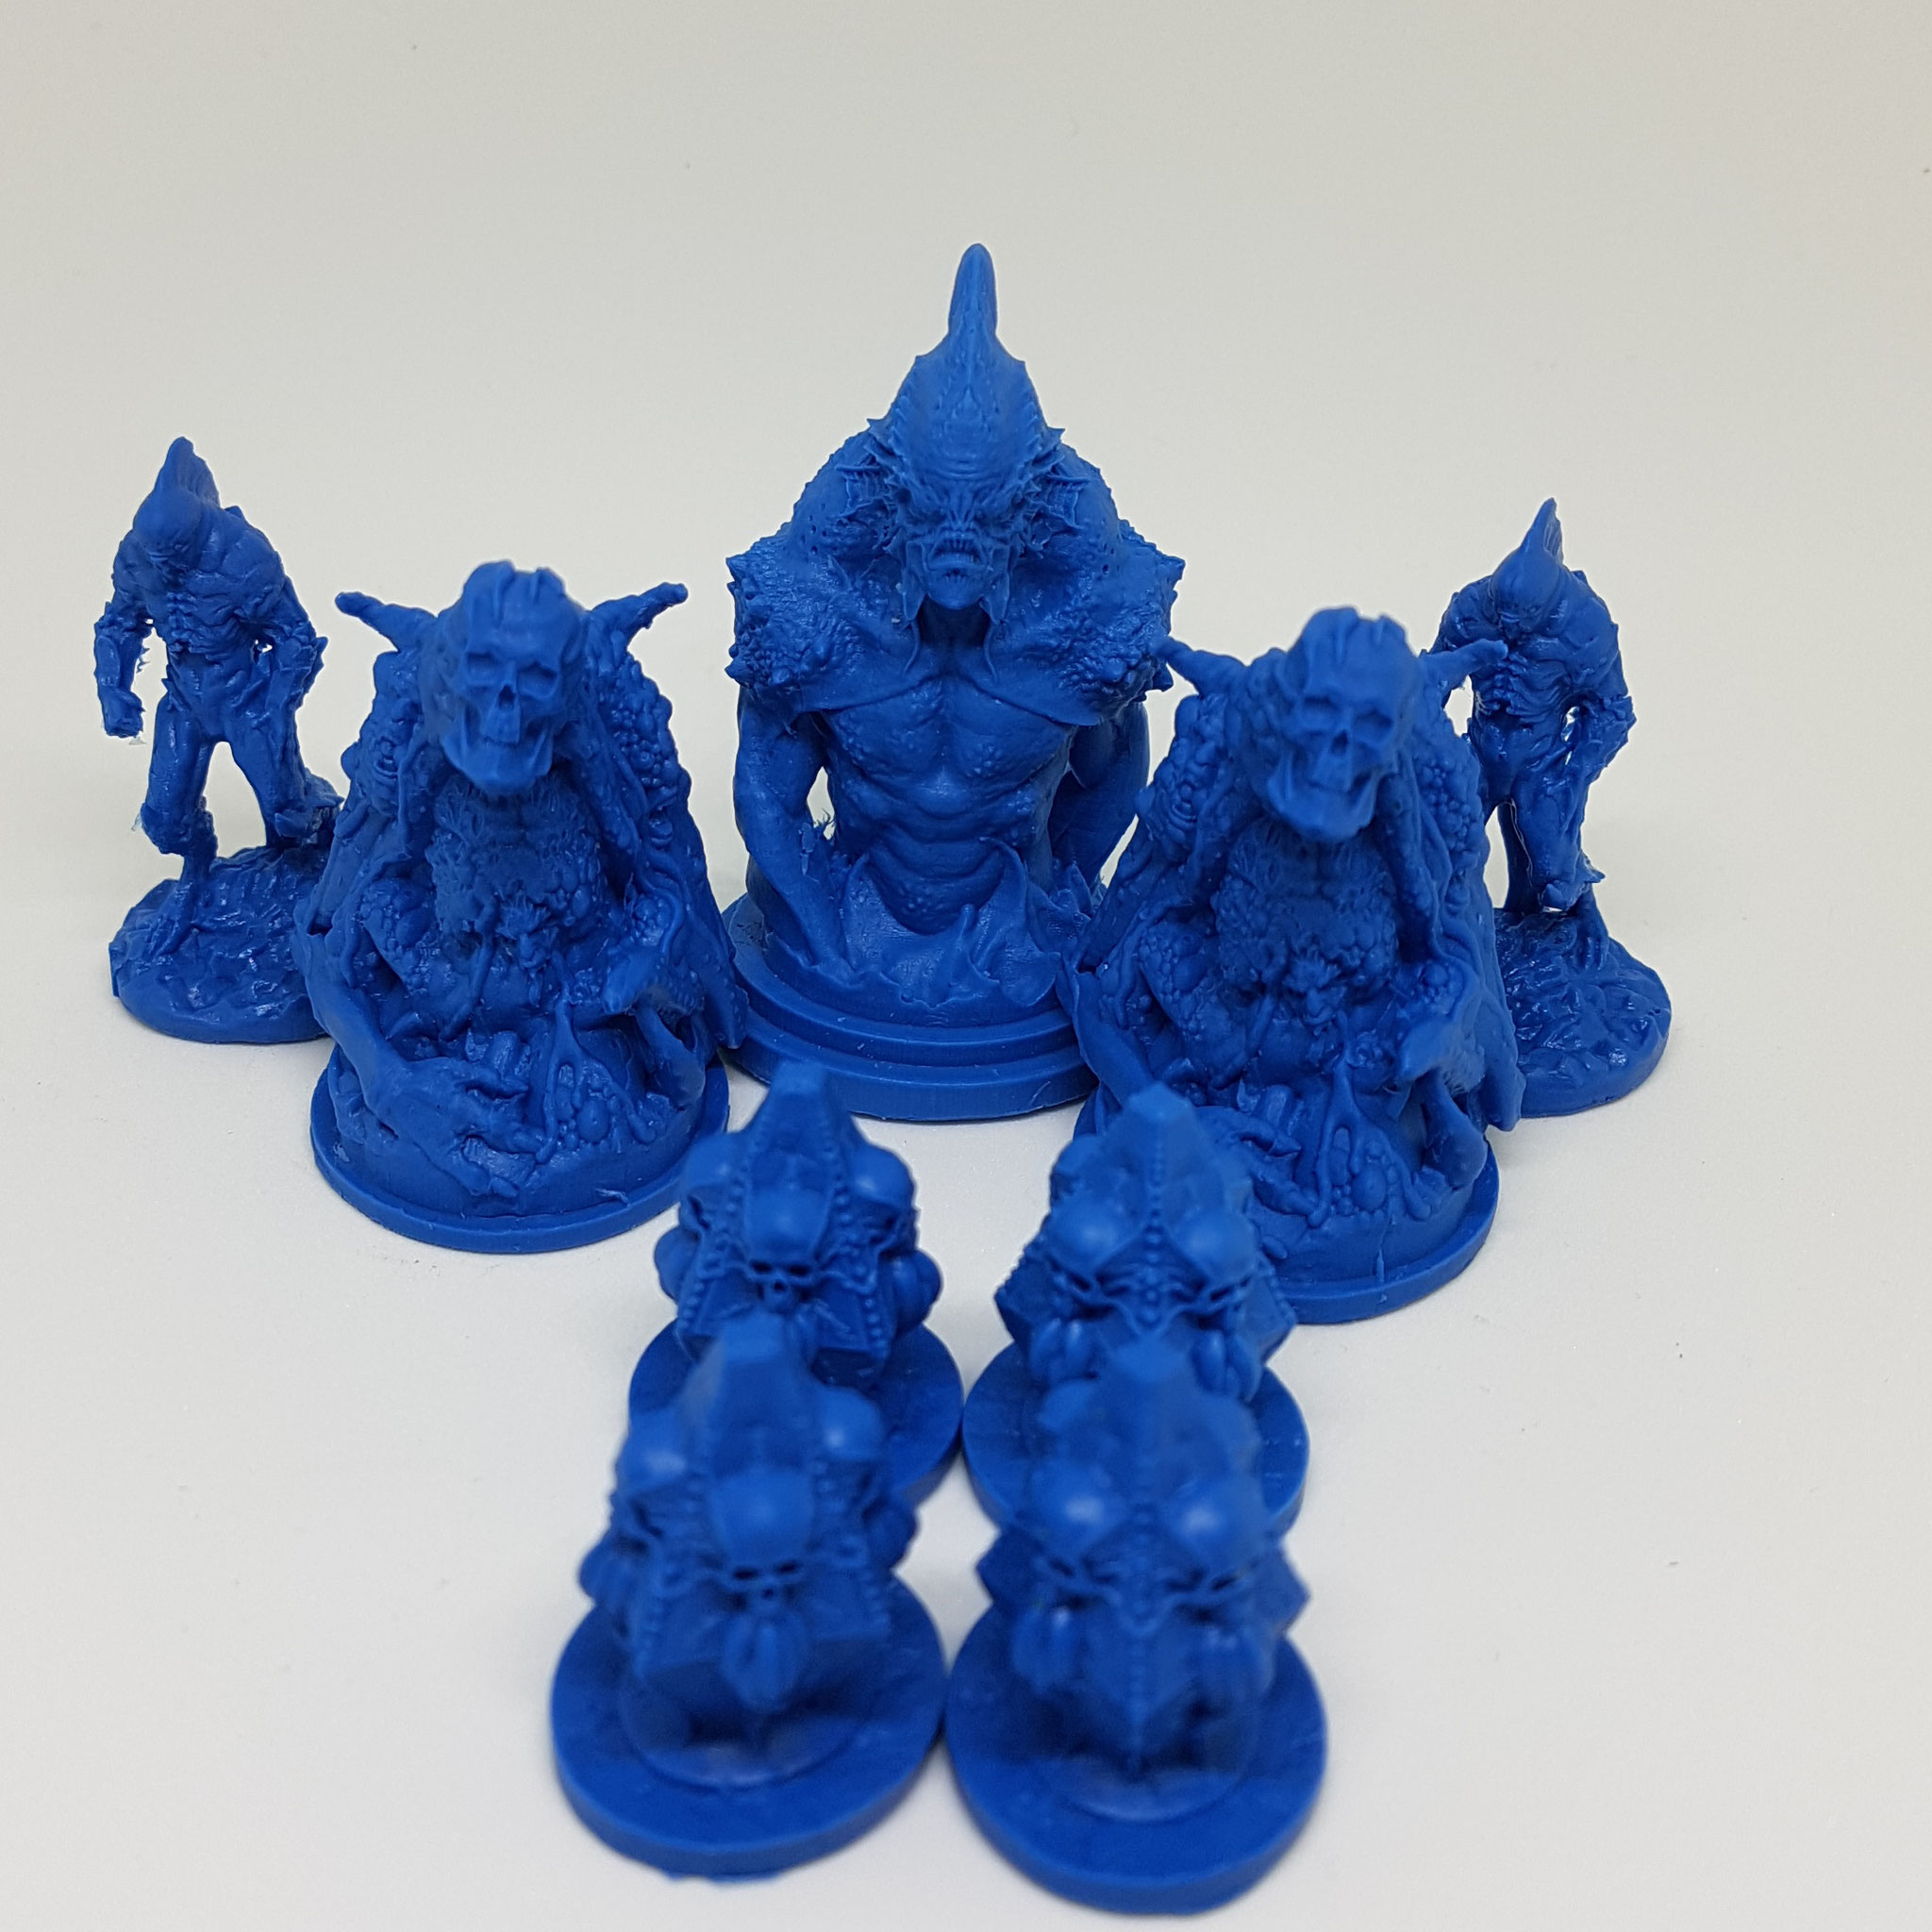 Kickstarter Exclusive Blau